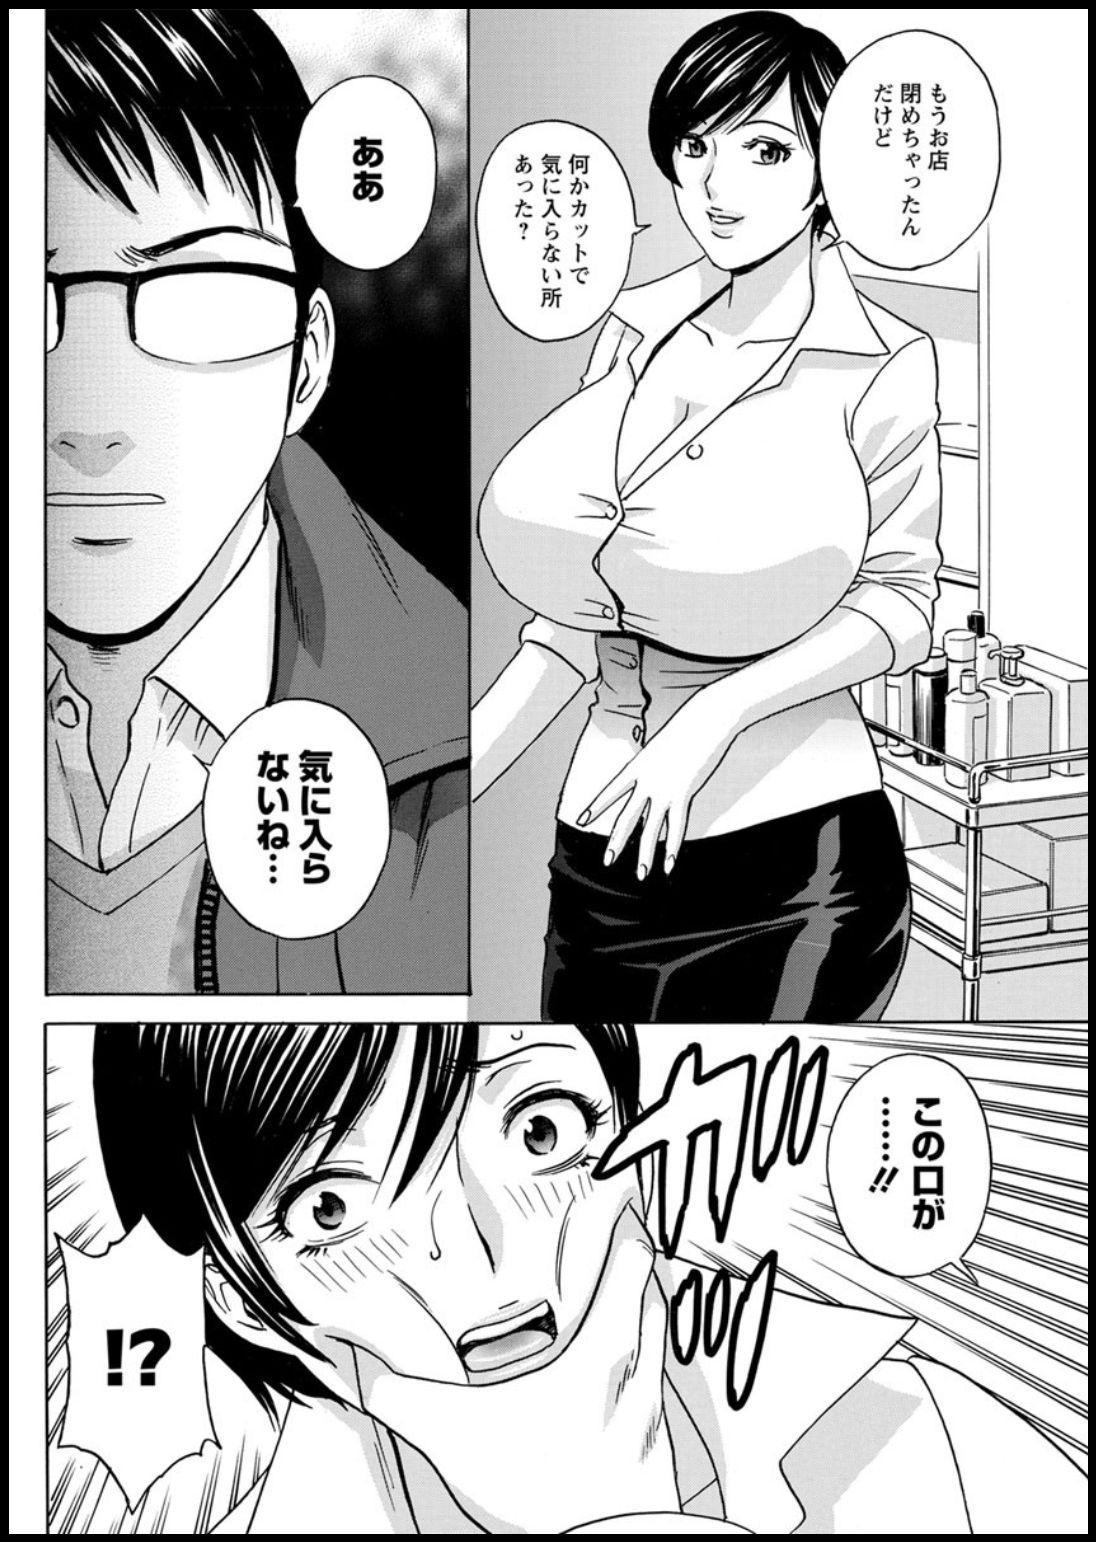 [Hidemaru] Yurase Bikyonyuu! Hataraku J-Cup Ch. 1-5 [Digital] 81